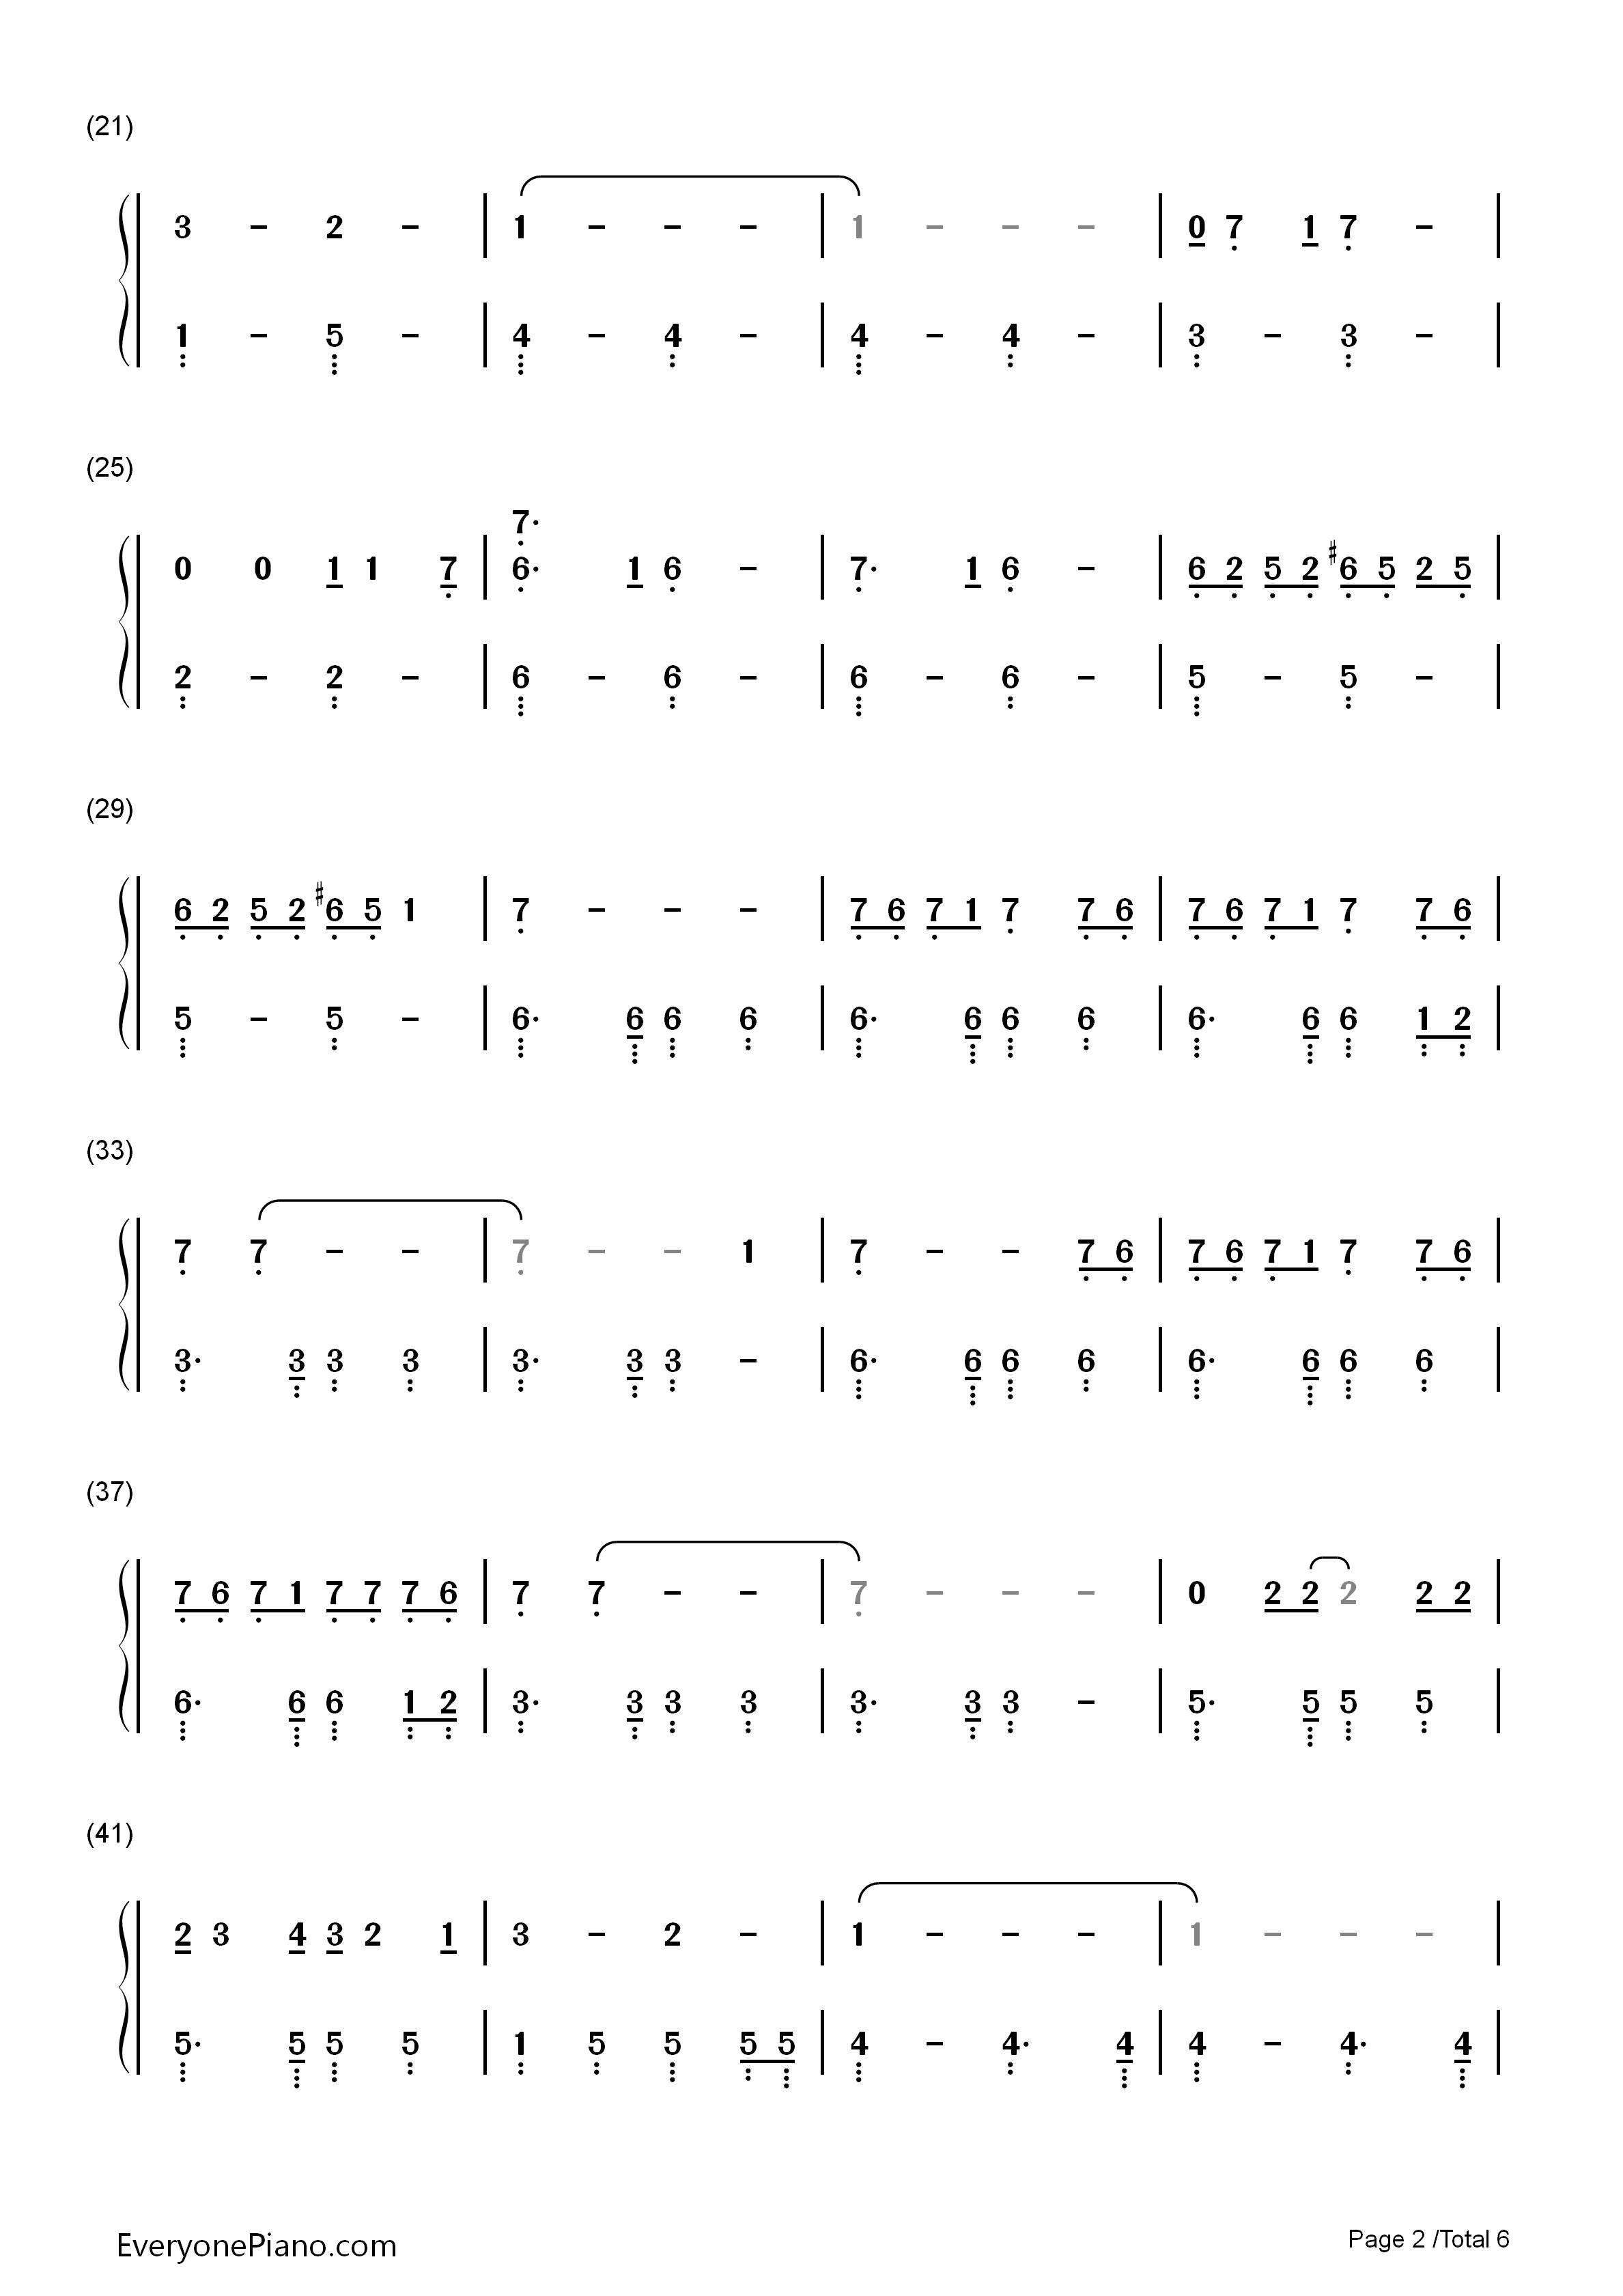 Hey You Pink Floyd双手简谱预览2 钢琴谱档 五线谱 双手简谱 数位谱